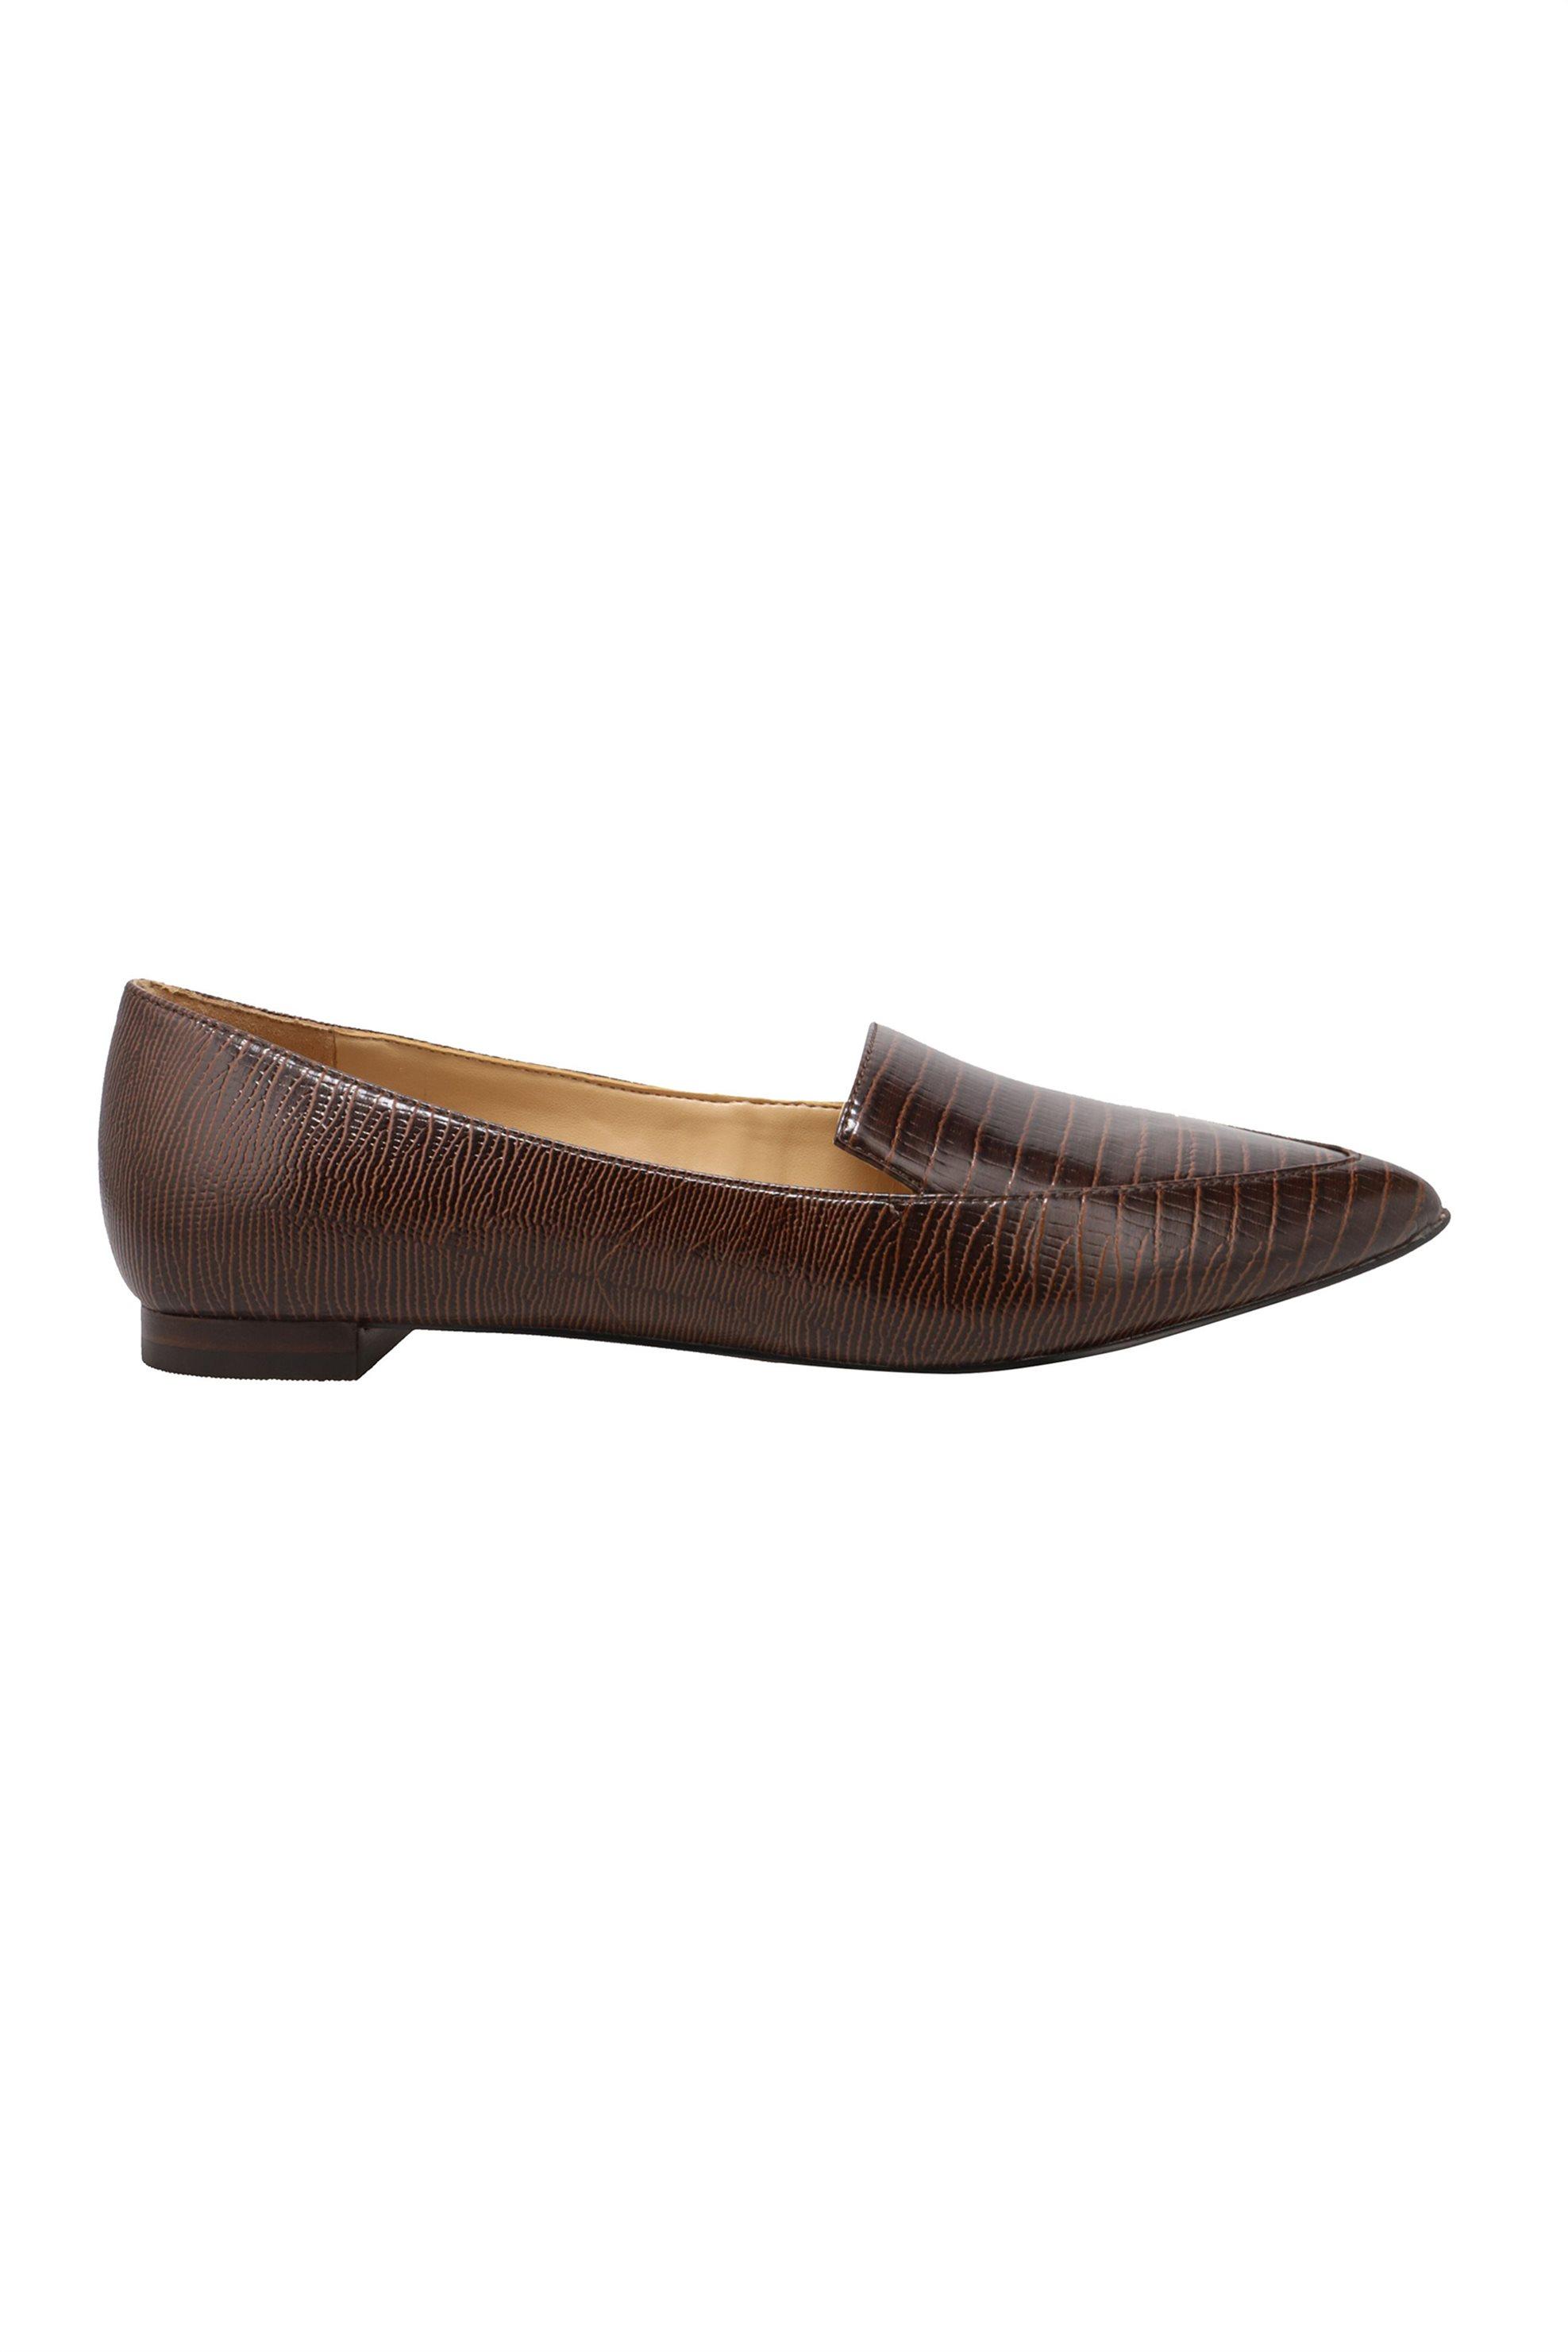 "Nine West γυναικεία flat παπούτσια με croco print ""Abay"" – ABAY3 TX – Καφέ"